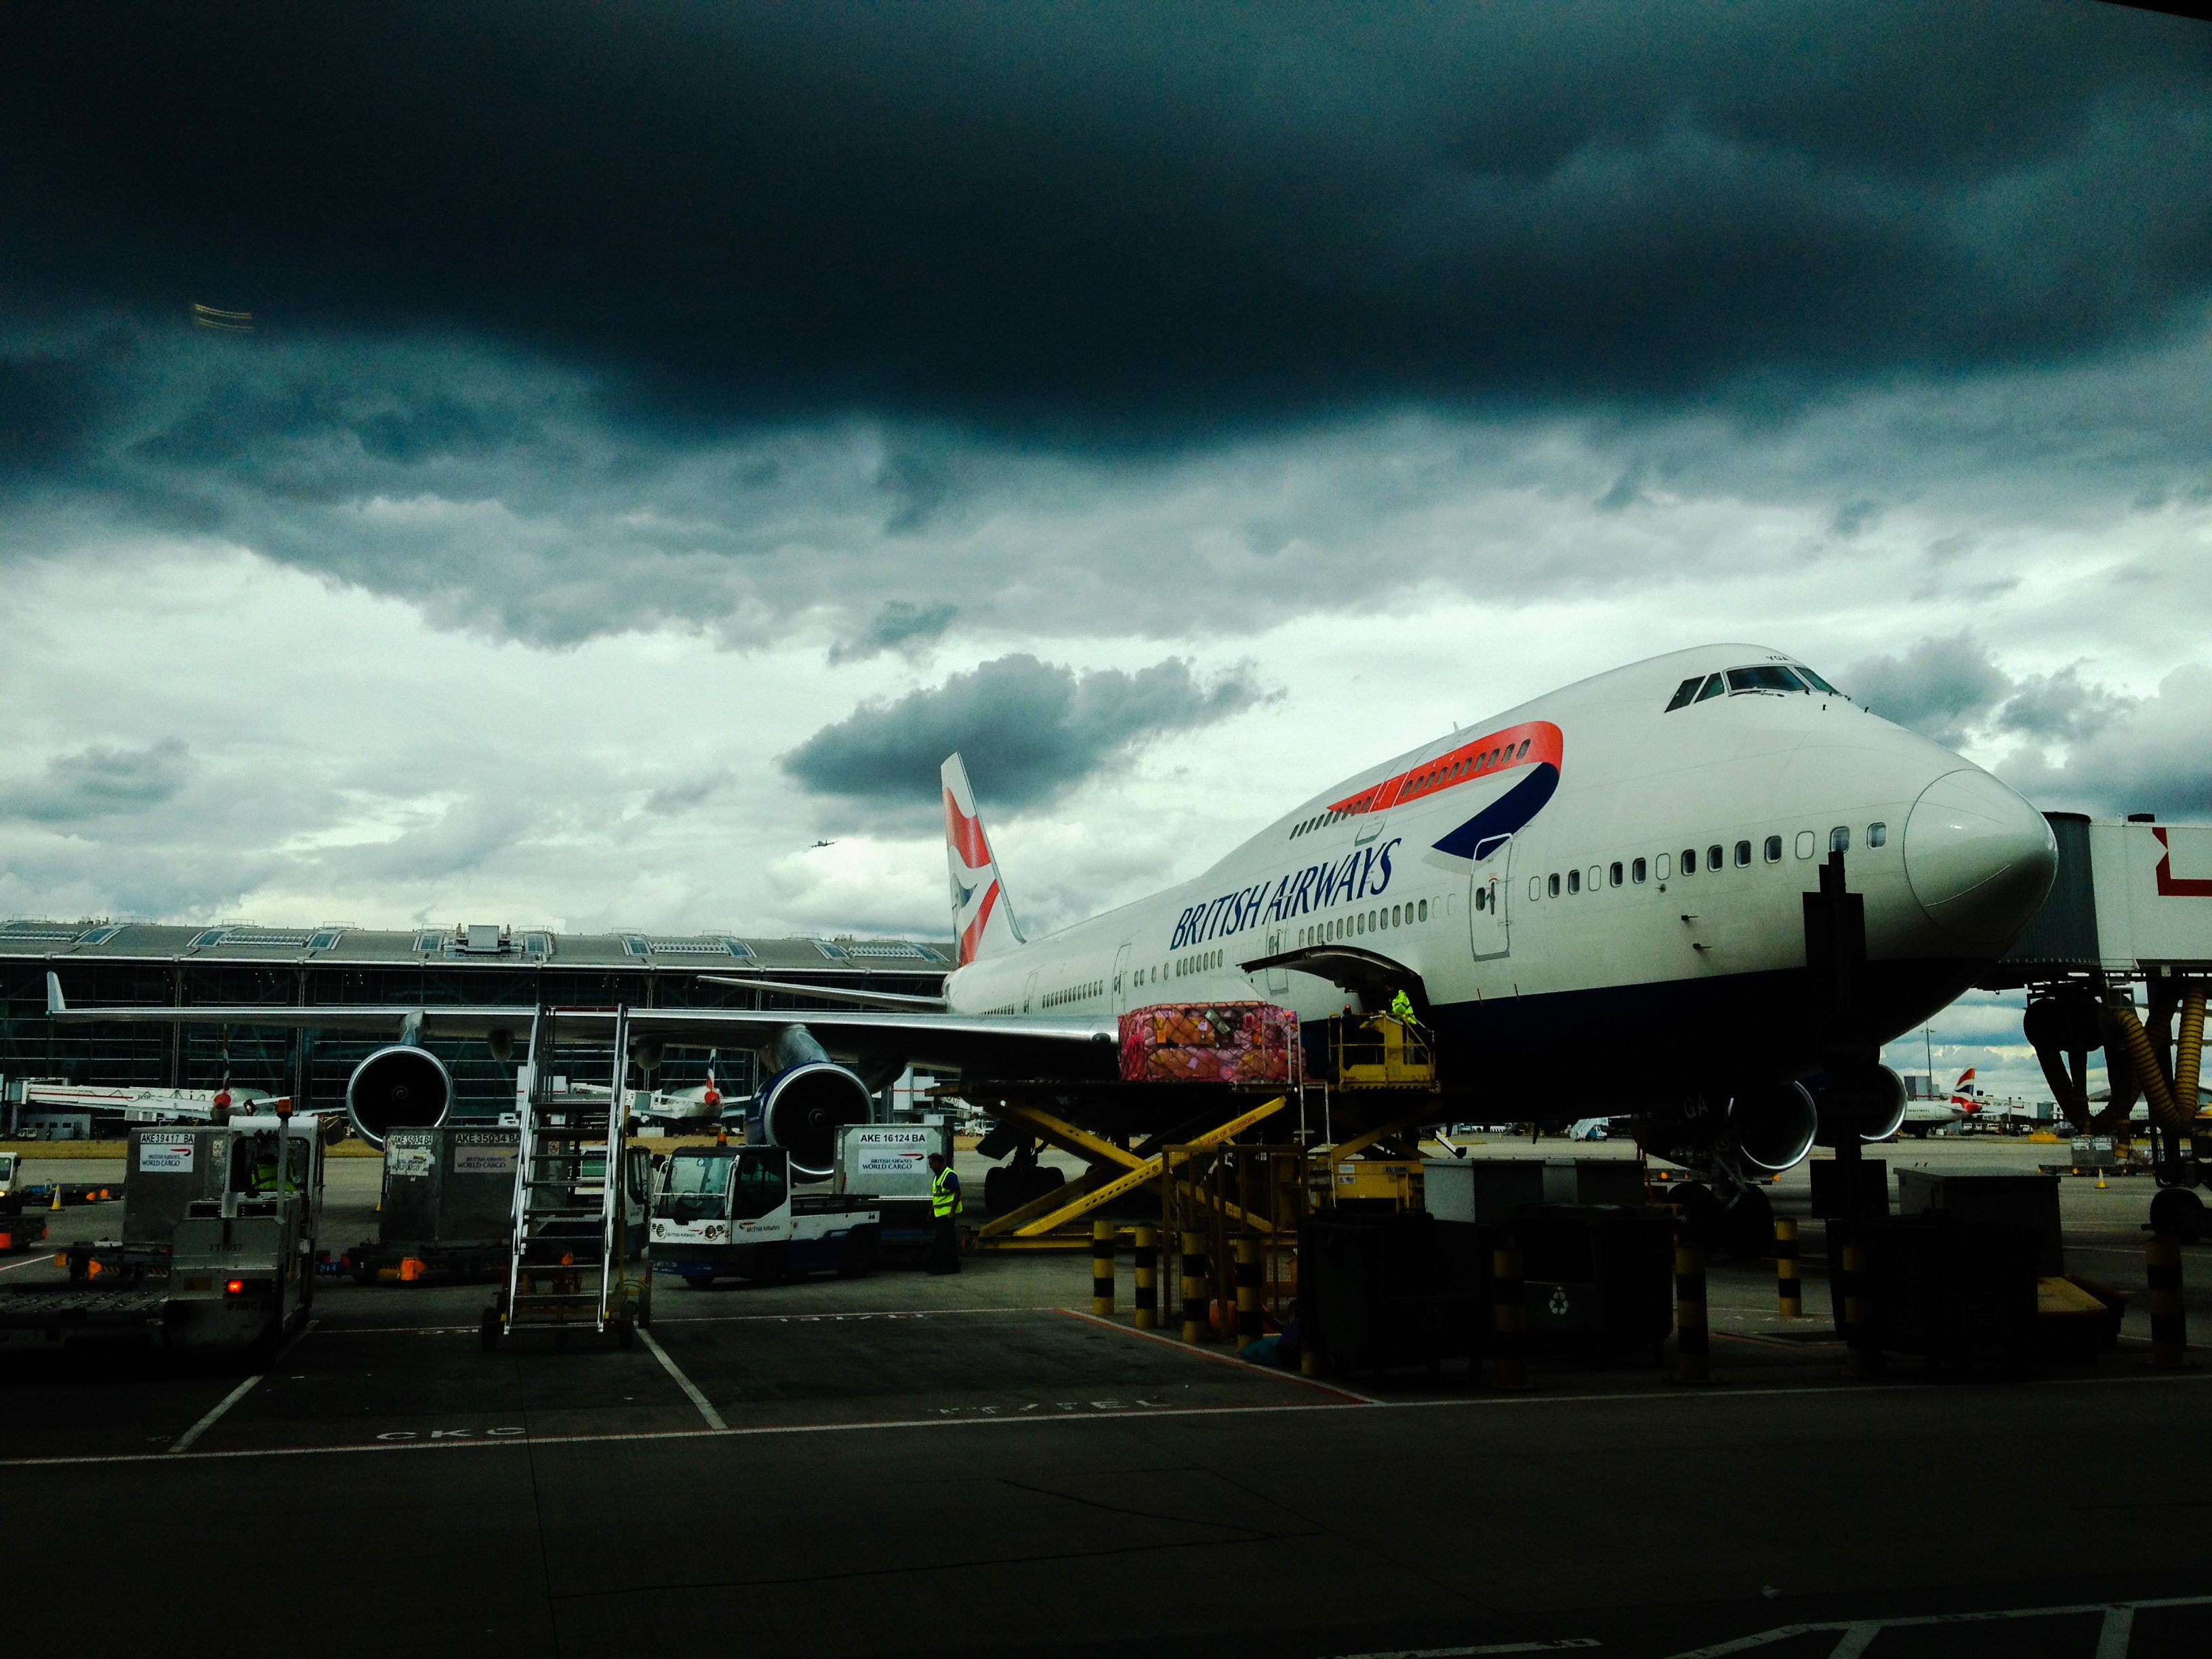 British Airways Airplane at Gate